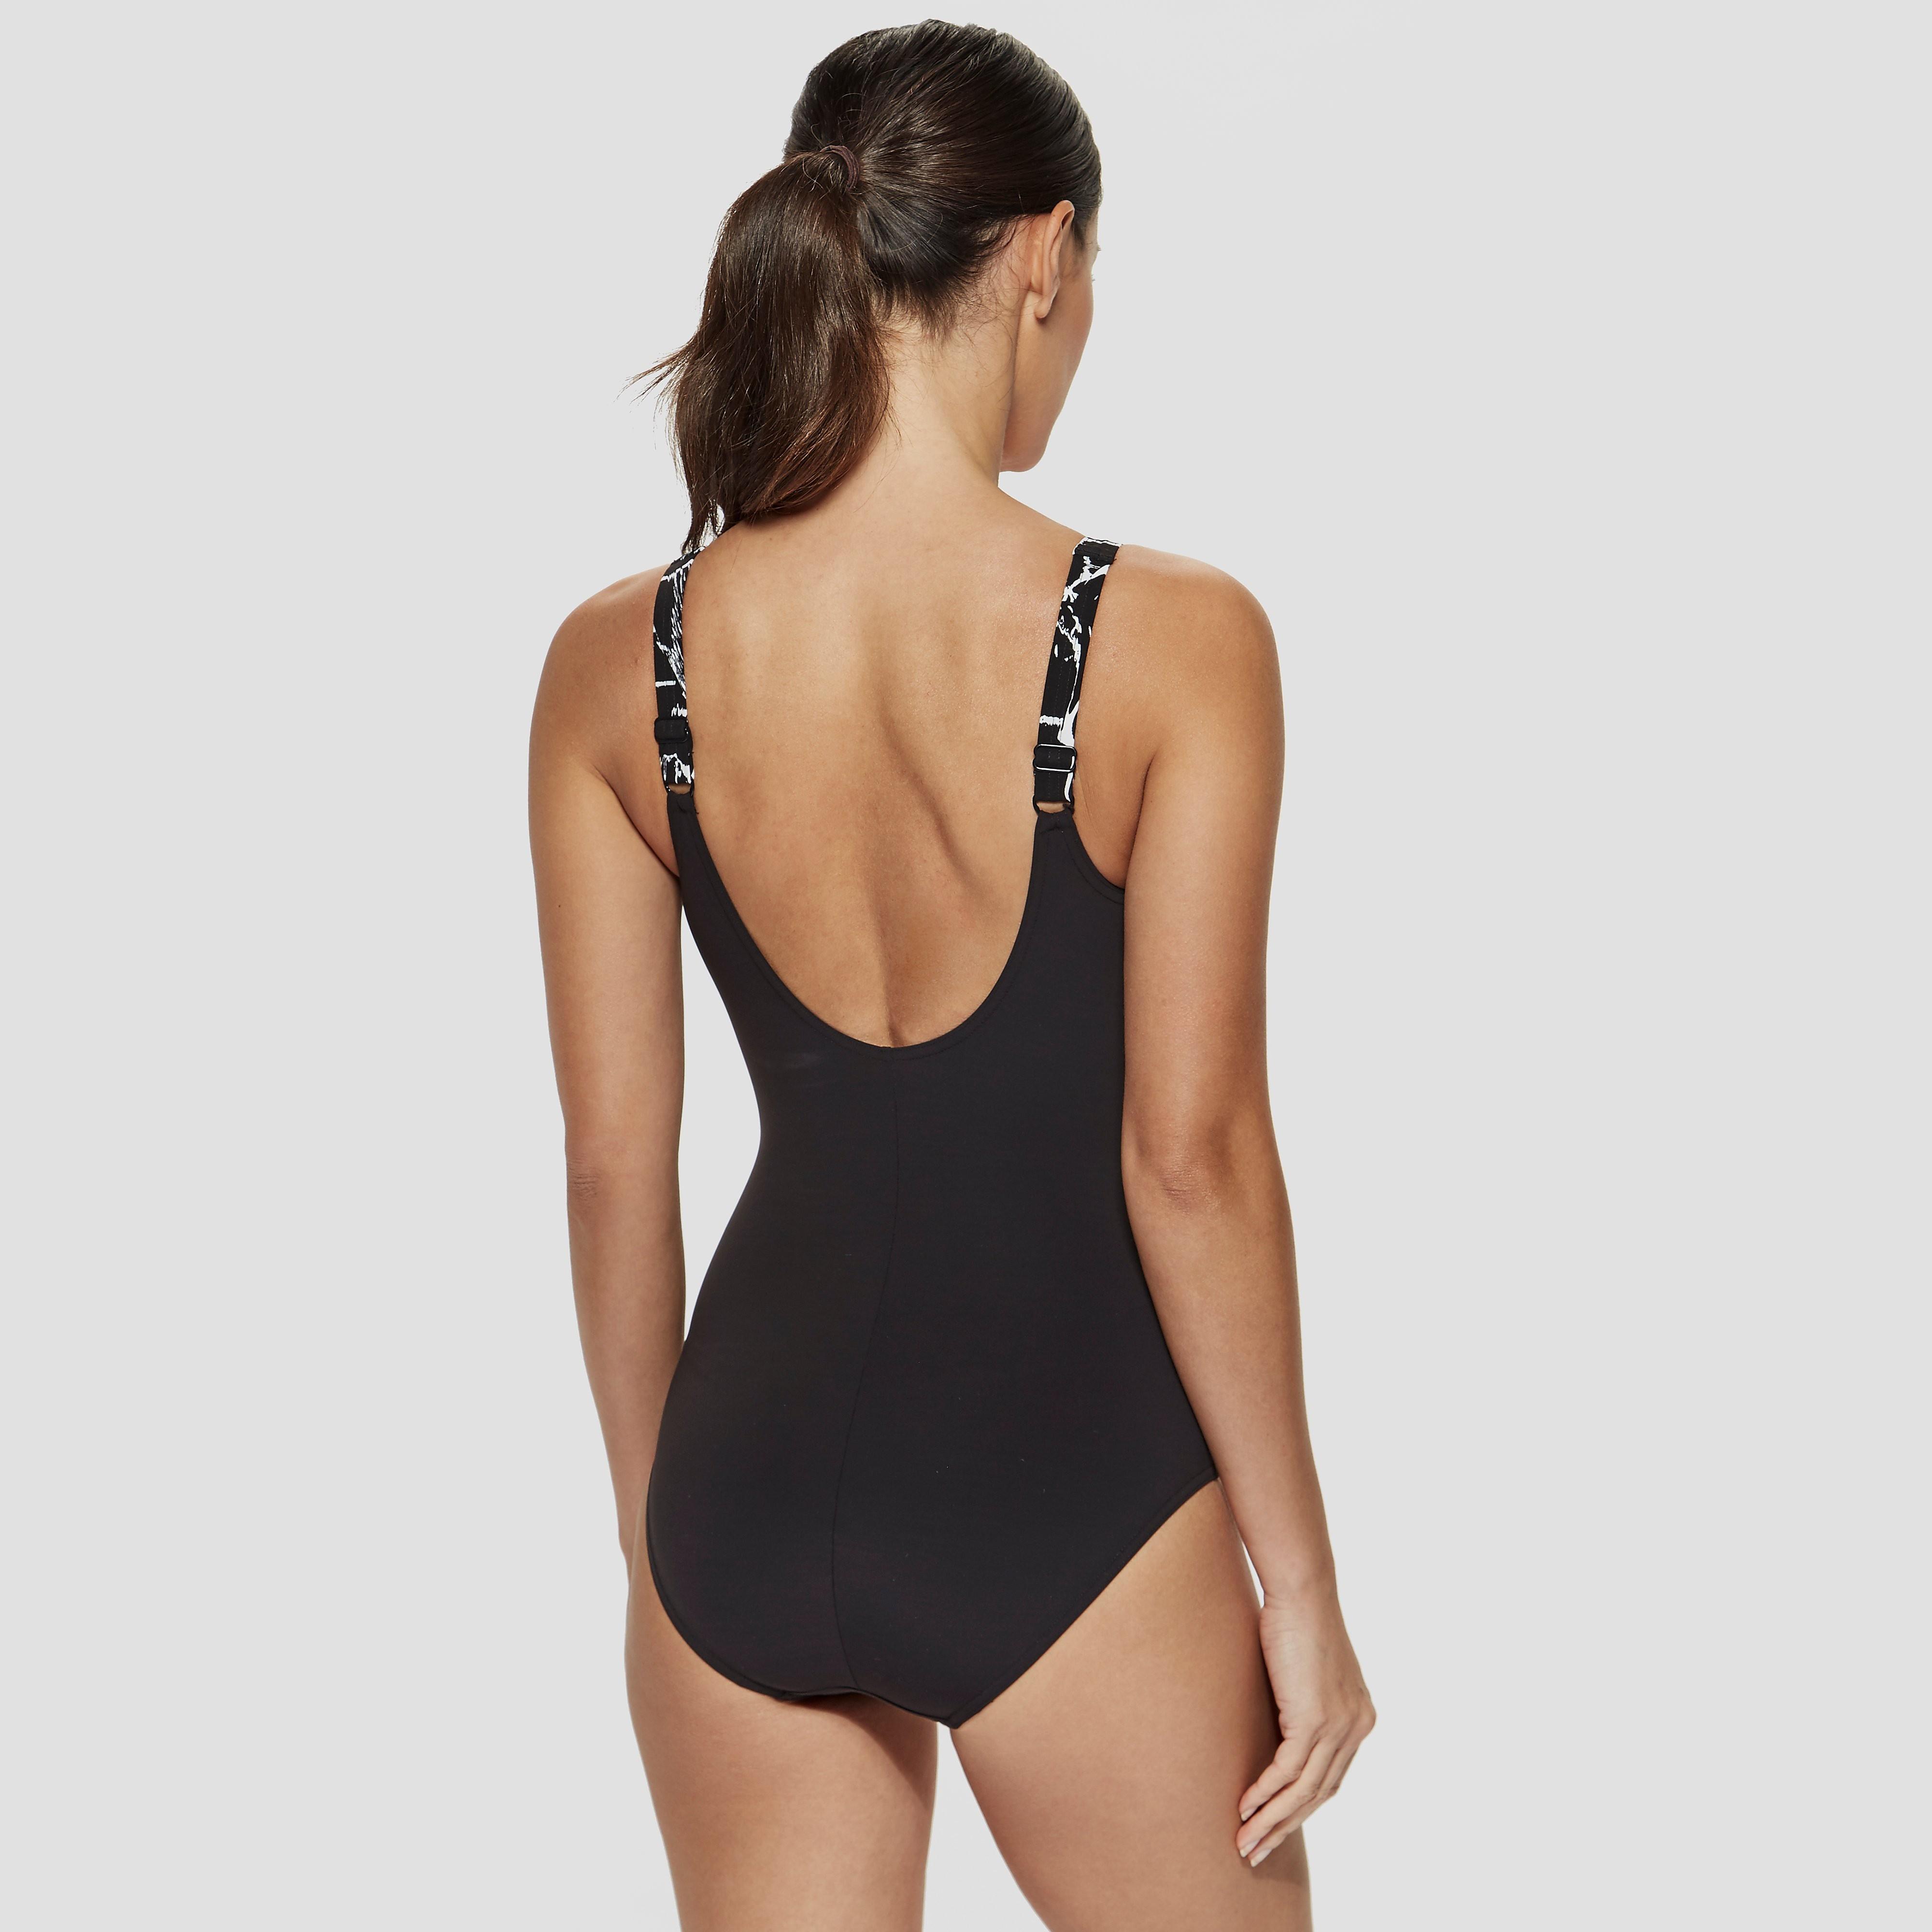 Speedo Sculpture LunaLustre Printed Swimsuit